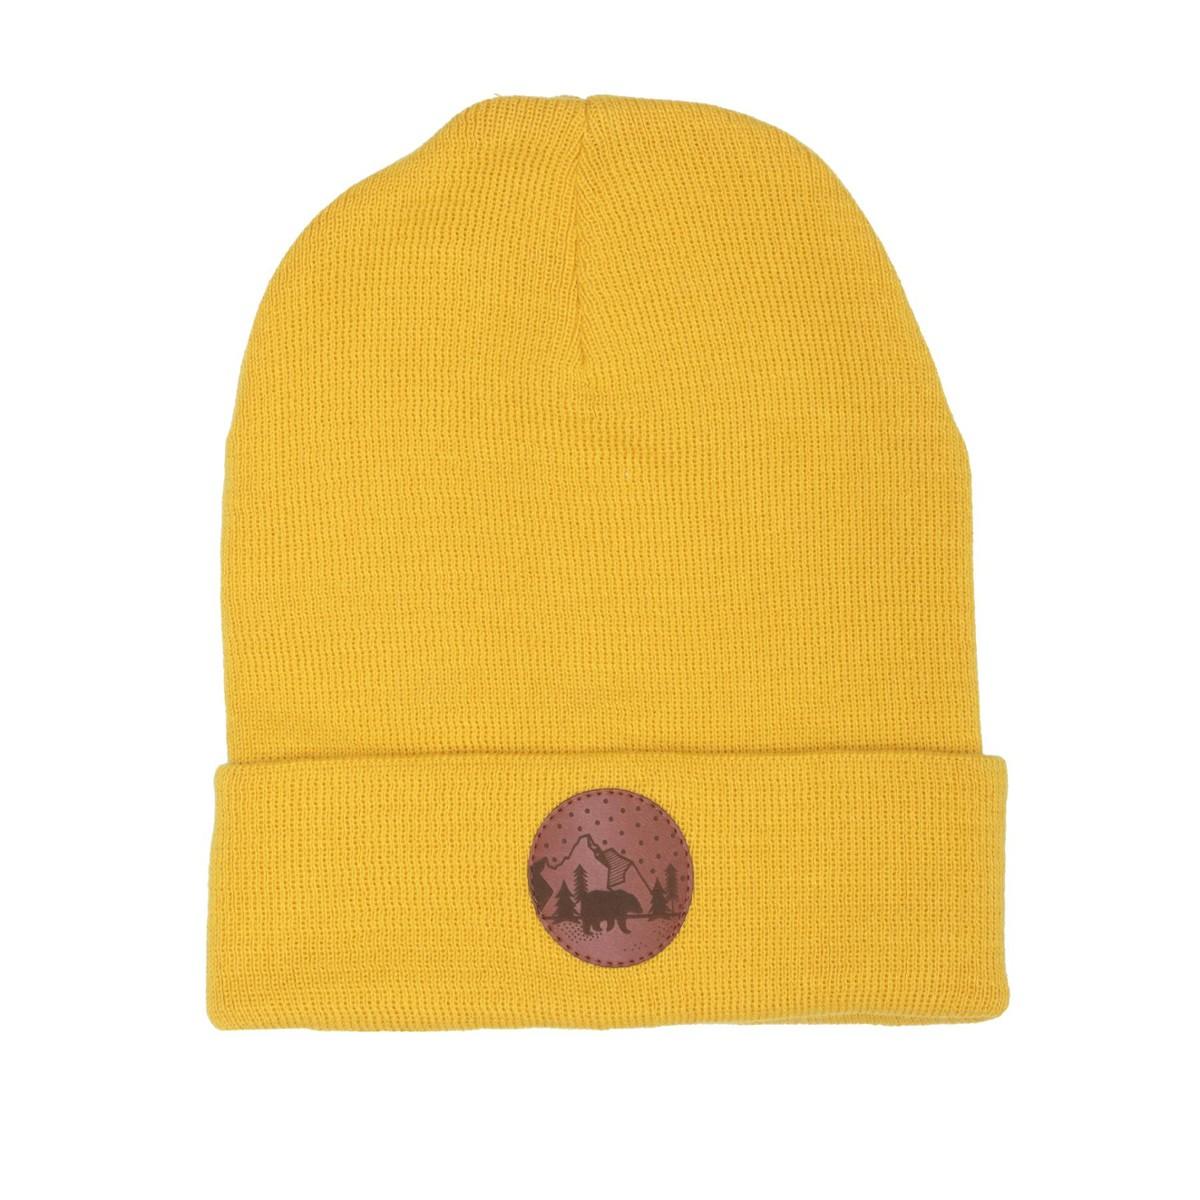 hat_beanie_cotton_yellow126D_kabak_5906742647242